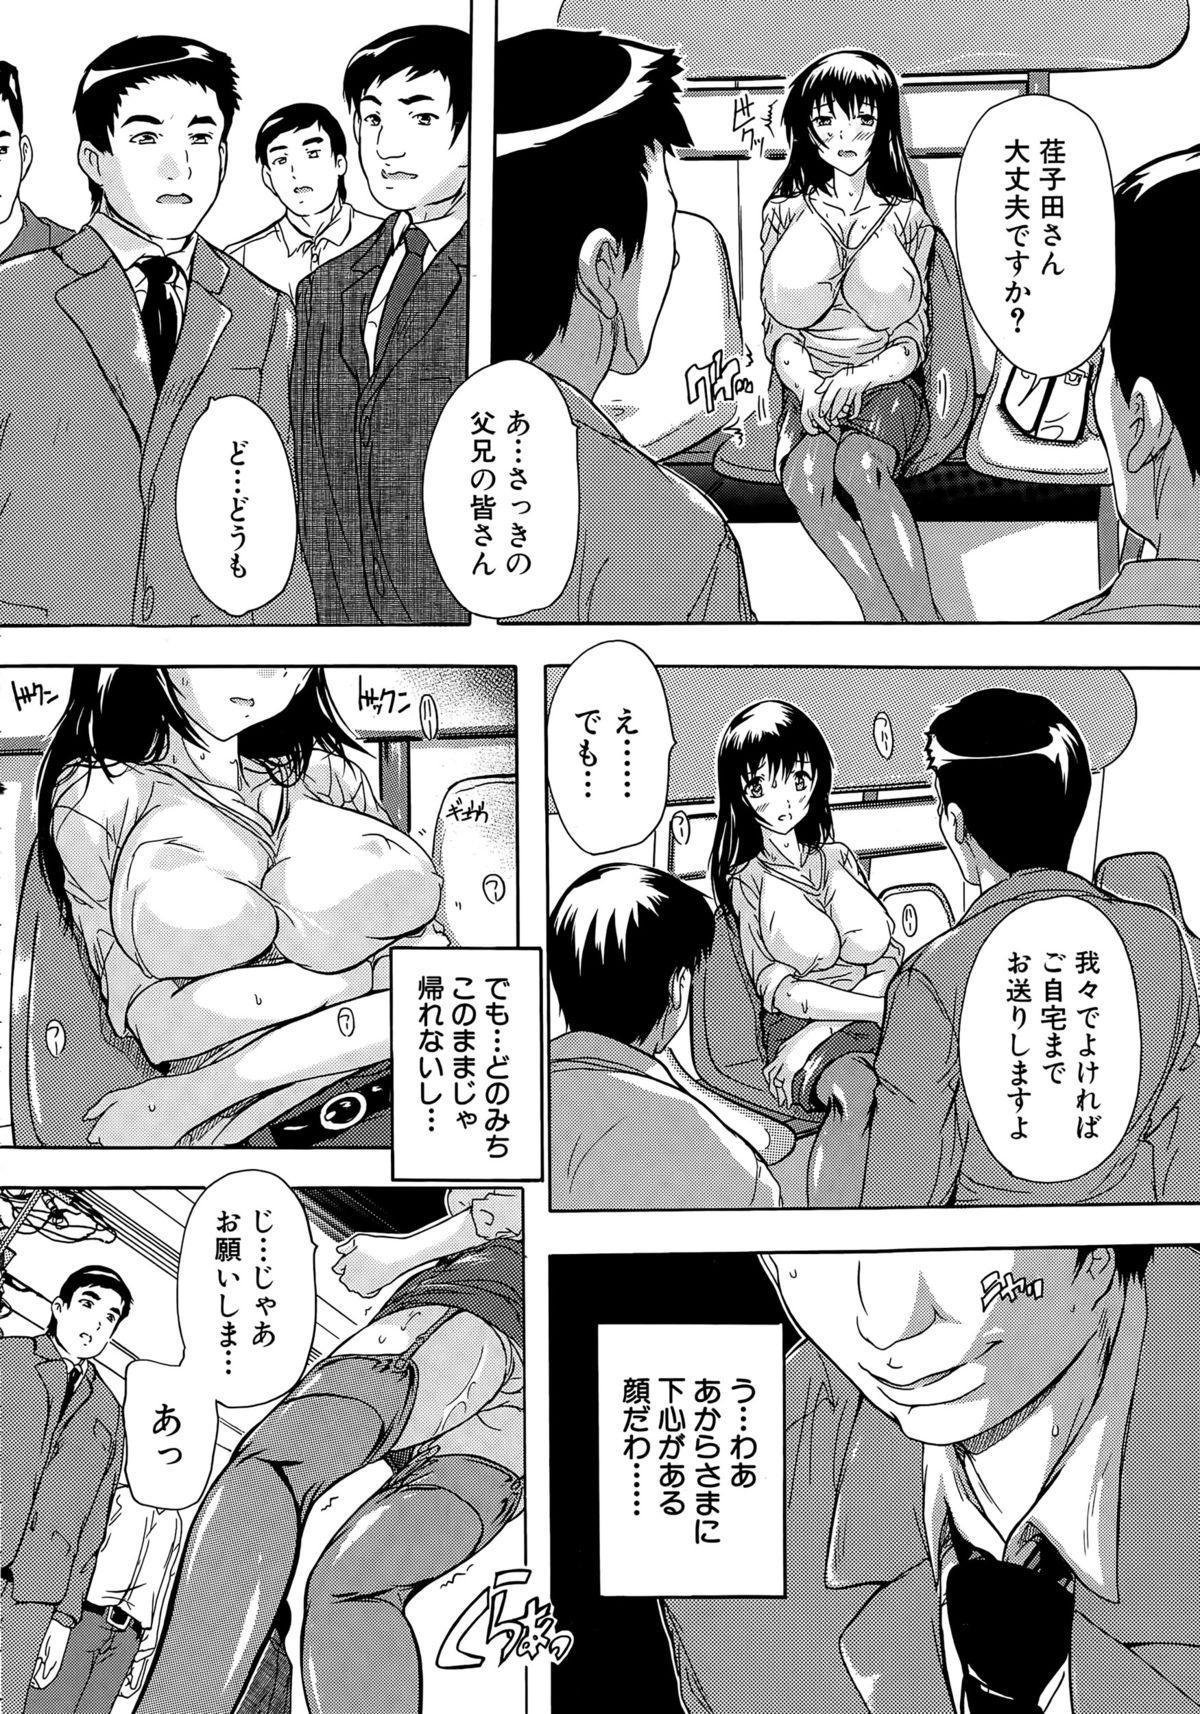 COMIC Mugen Tensei 2015-05 314